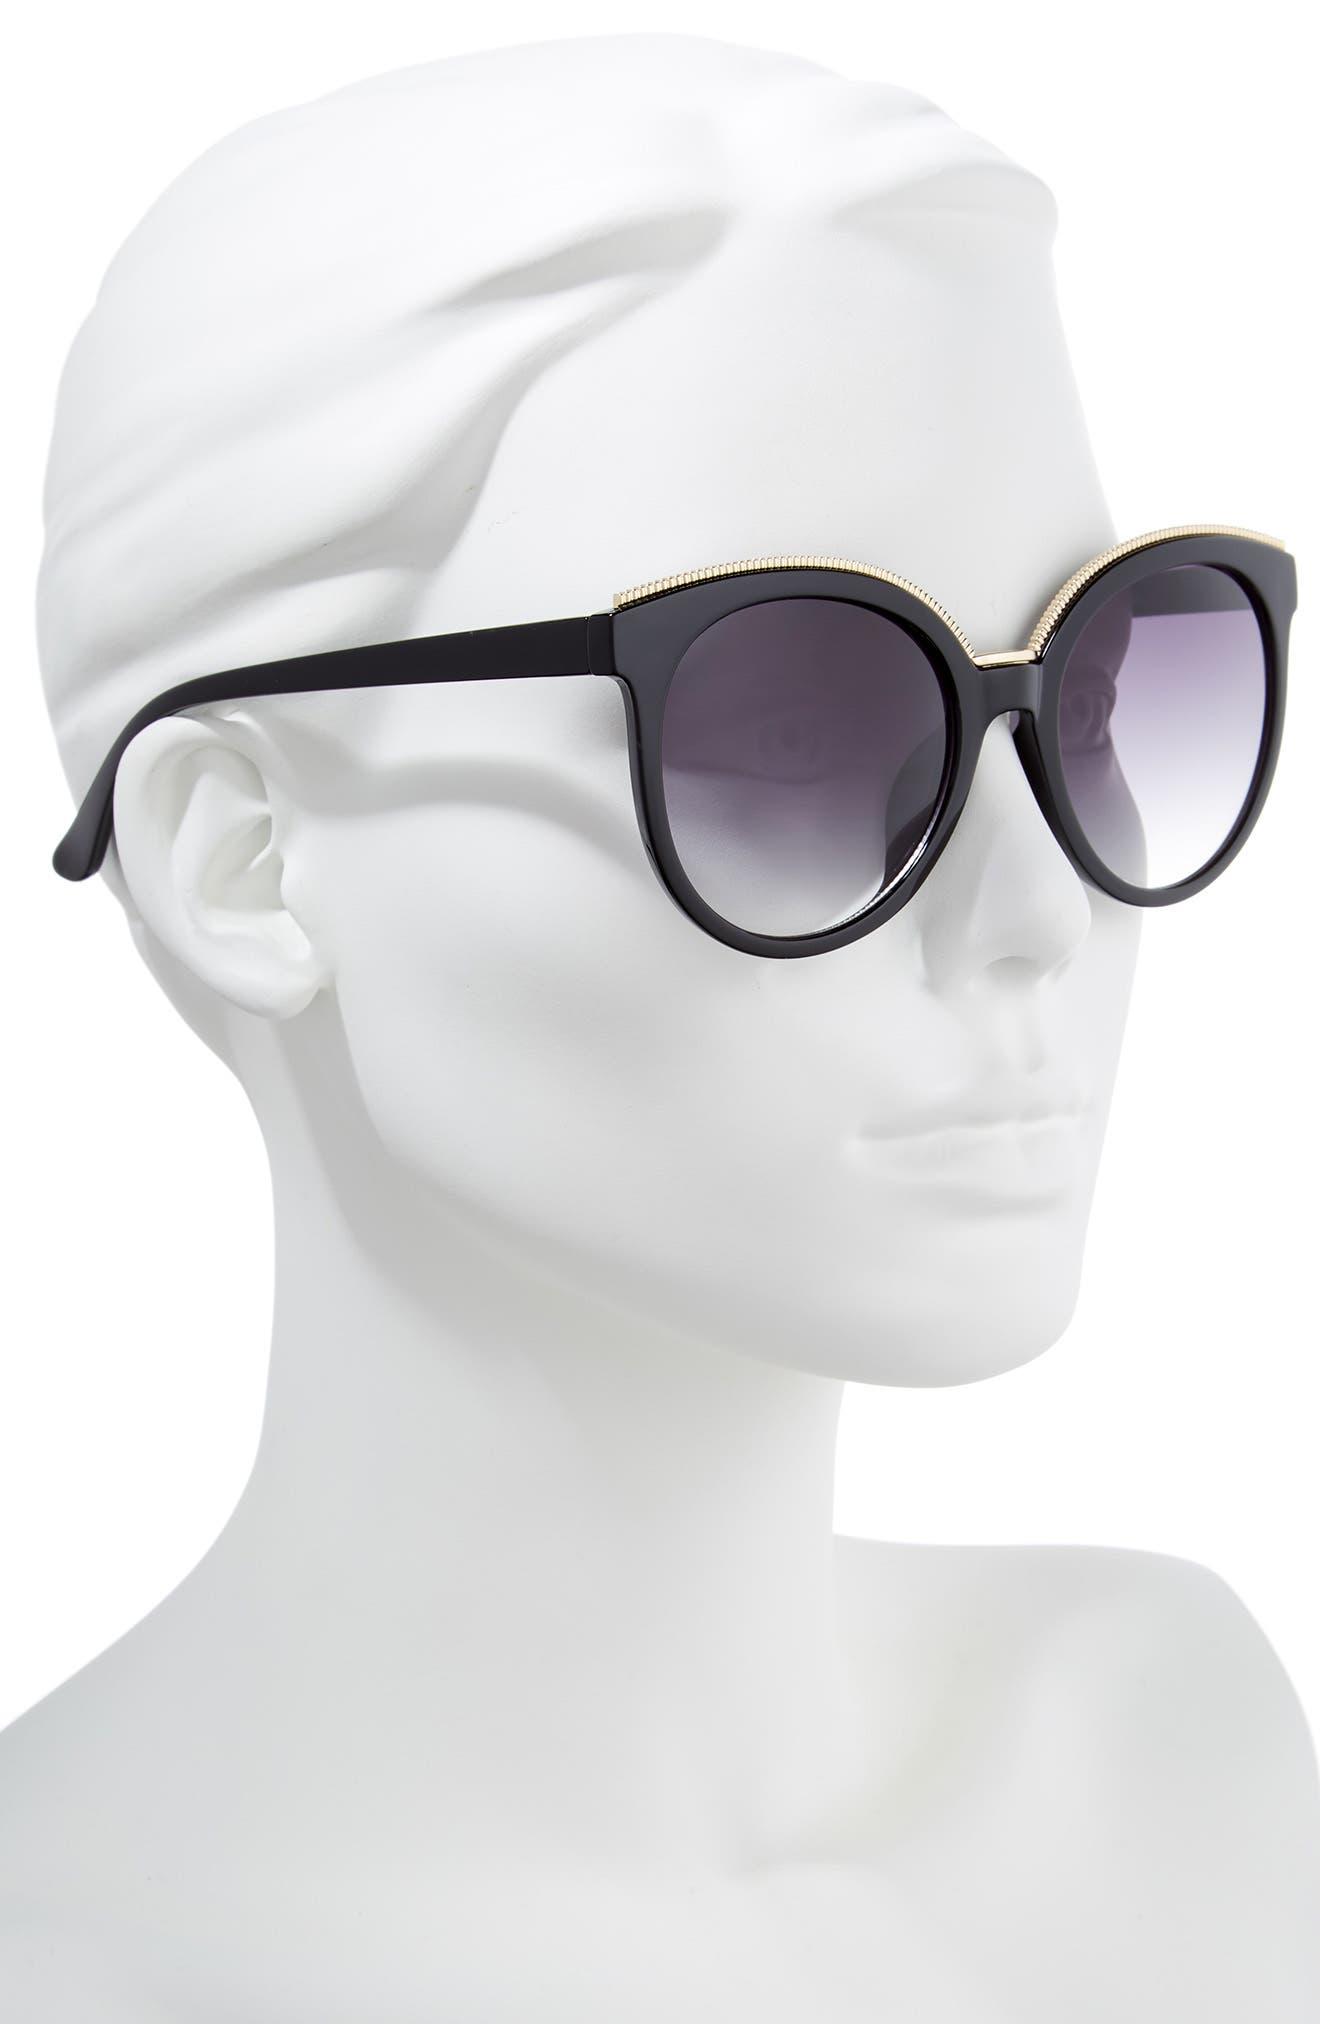 56mm Metal Trim Round Sunglasses,                             Alternate thumbnail 2, color,                             Black/ Gold